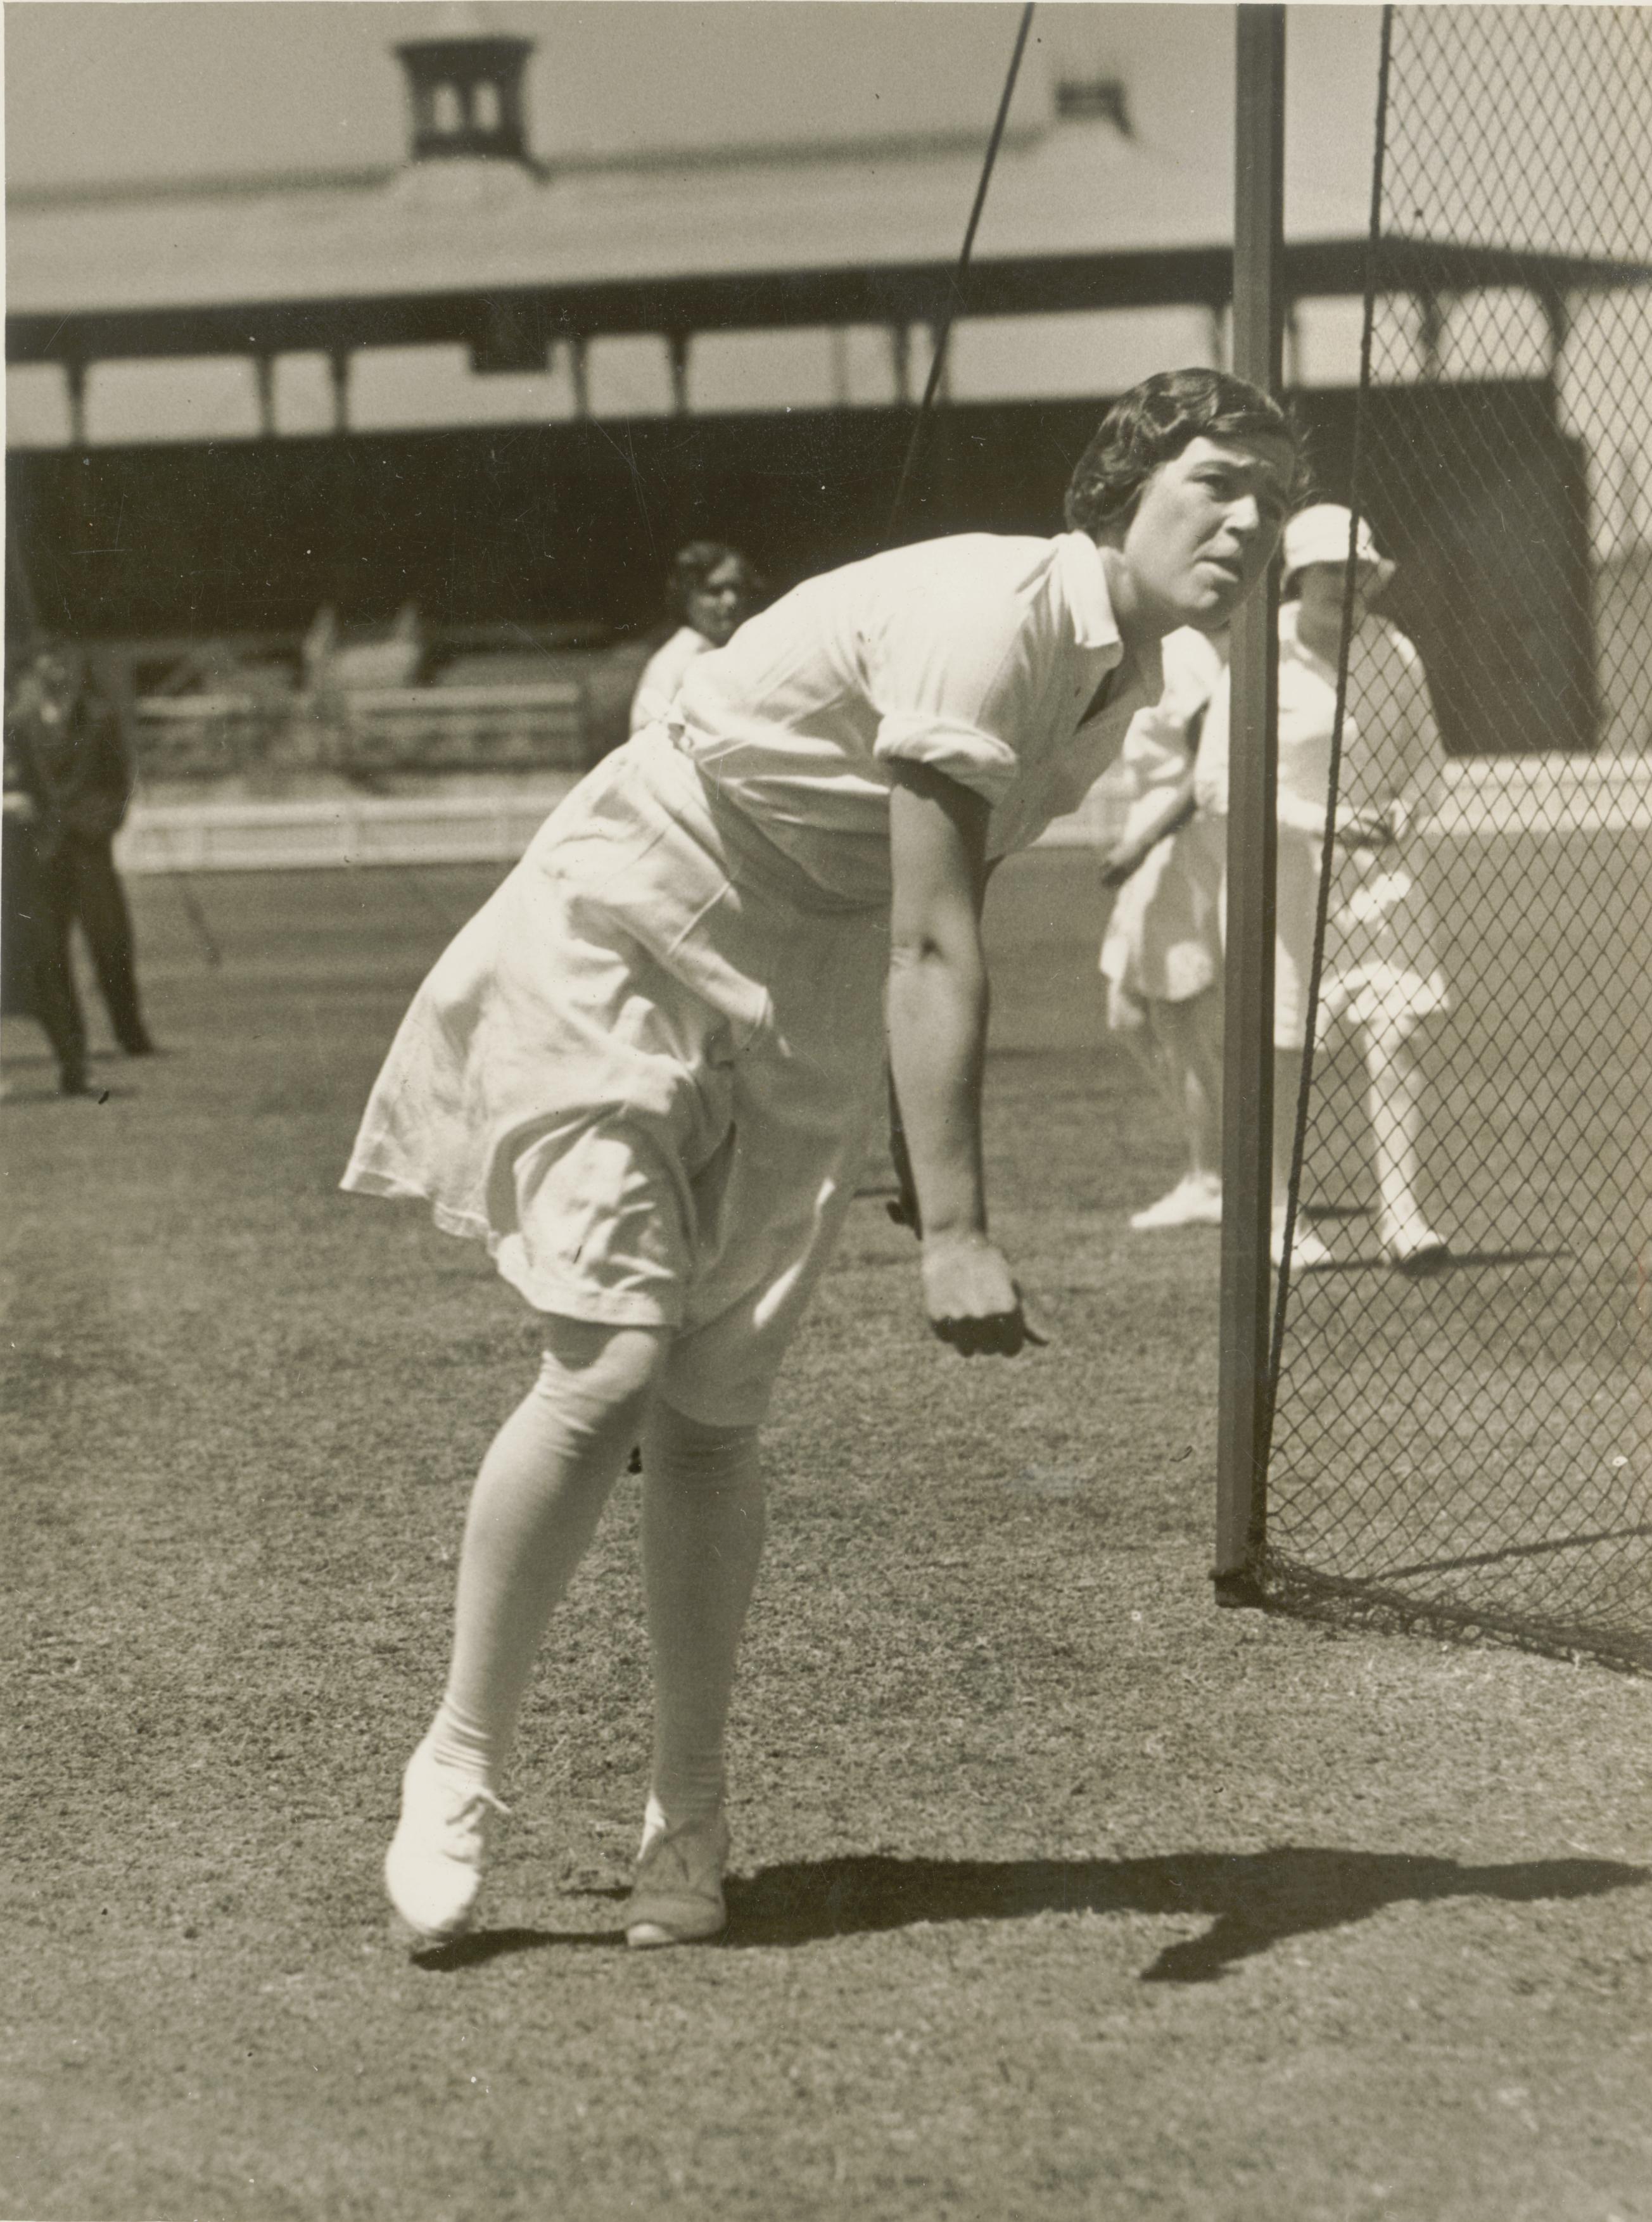 Miss M. Maclagan, playing cricket, ca. 1935, Sam Hood